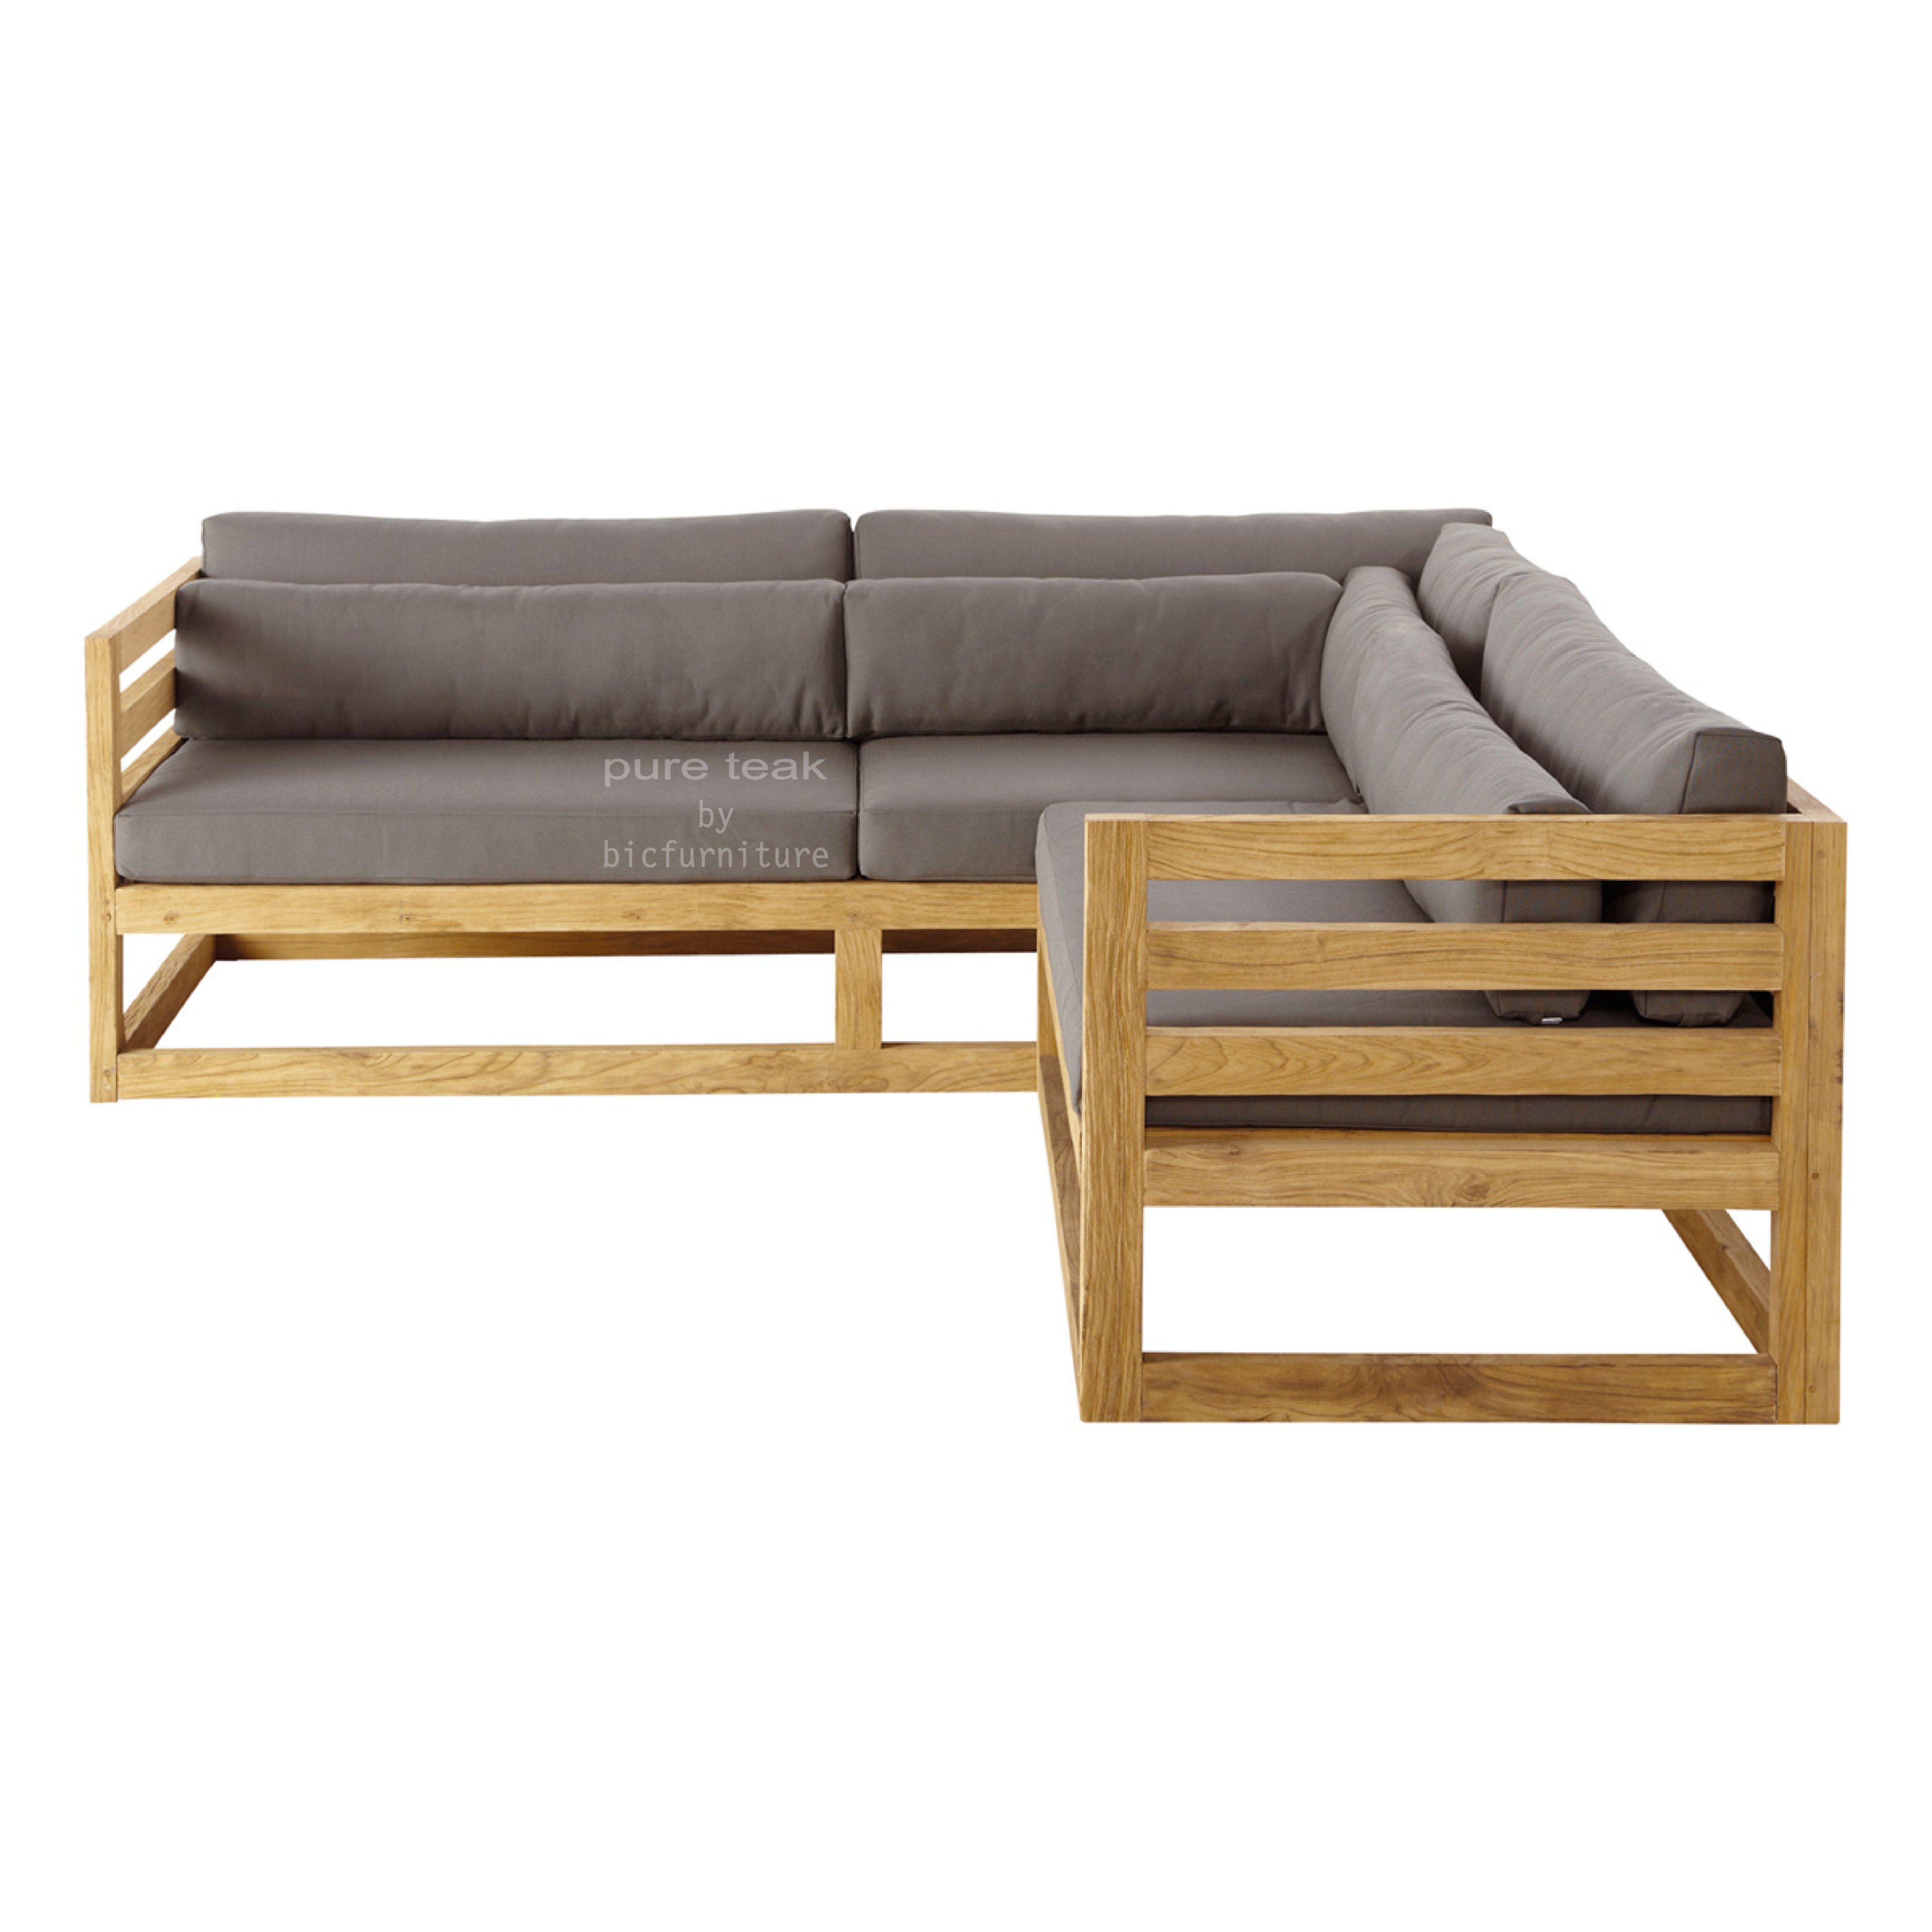 Wooden Sofa L Shape Thisa Patio Wooden Sofa L Shape Is Made From Premium Grade Indonesian Teak Wood This Sofa I Corner Sofa Design Wooden Sofa Corner Sofa Set